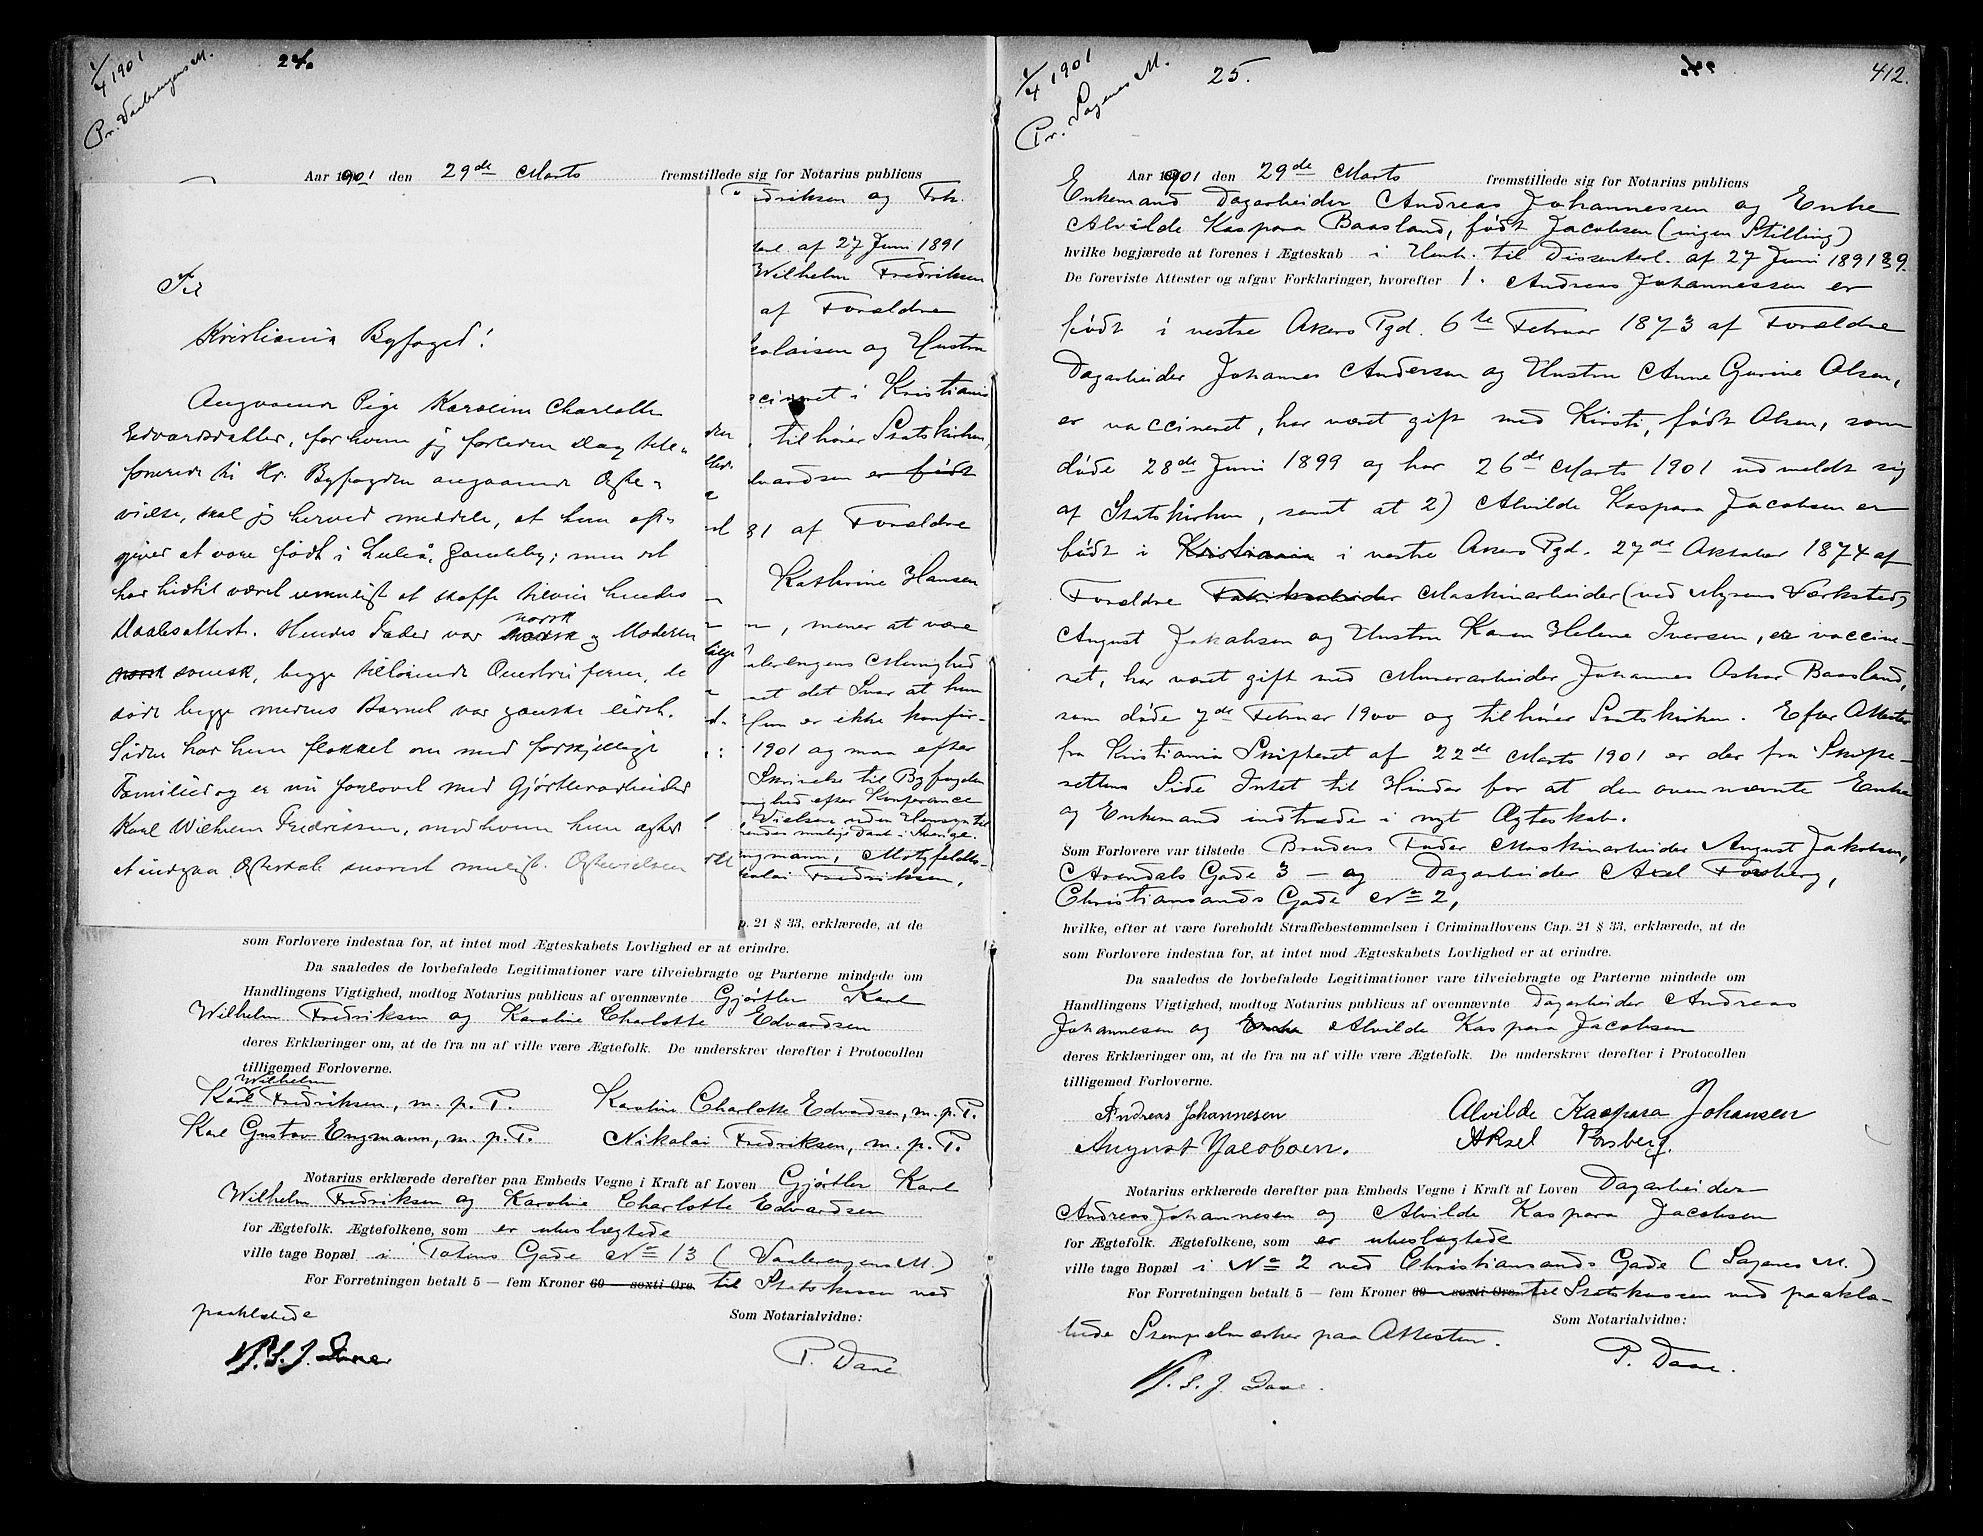 SAO, Oslo byfogd avd. I, L/Lb/Lbb/L0004: Notarialprotokoll, rekke II: Vigsler, 1897-1902, s. 411b-412a